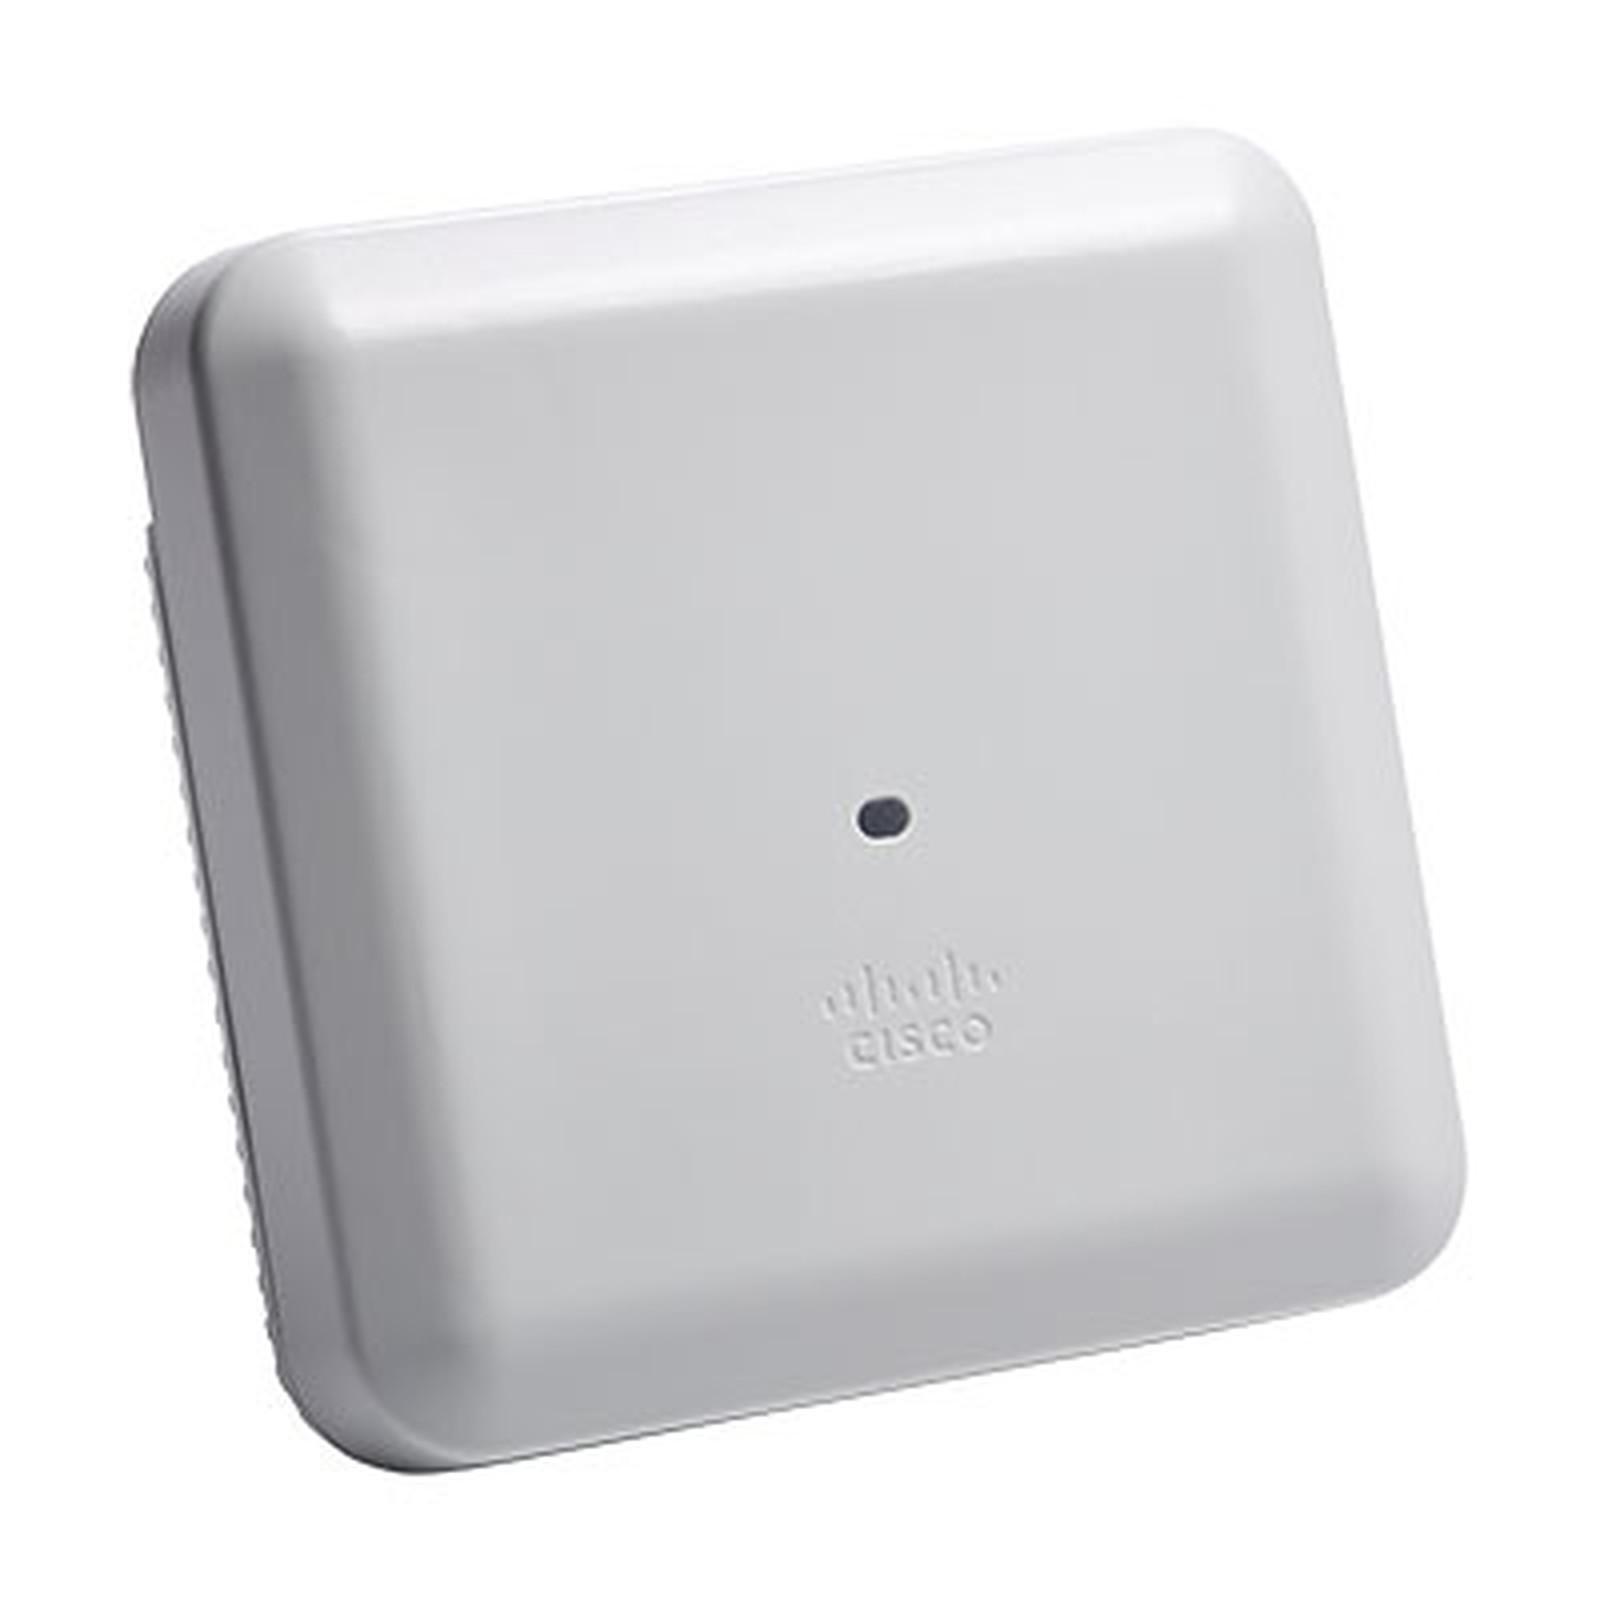 Cisco Aironet 3802i-e Access Point (AIR-AP3802I-E-K9)